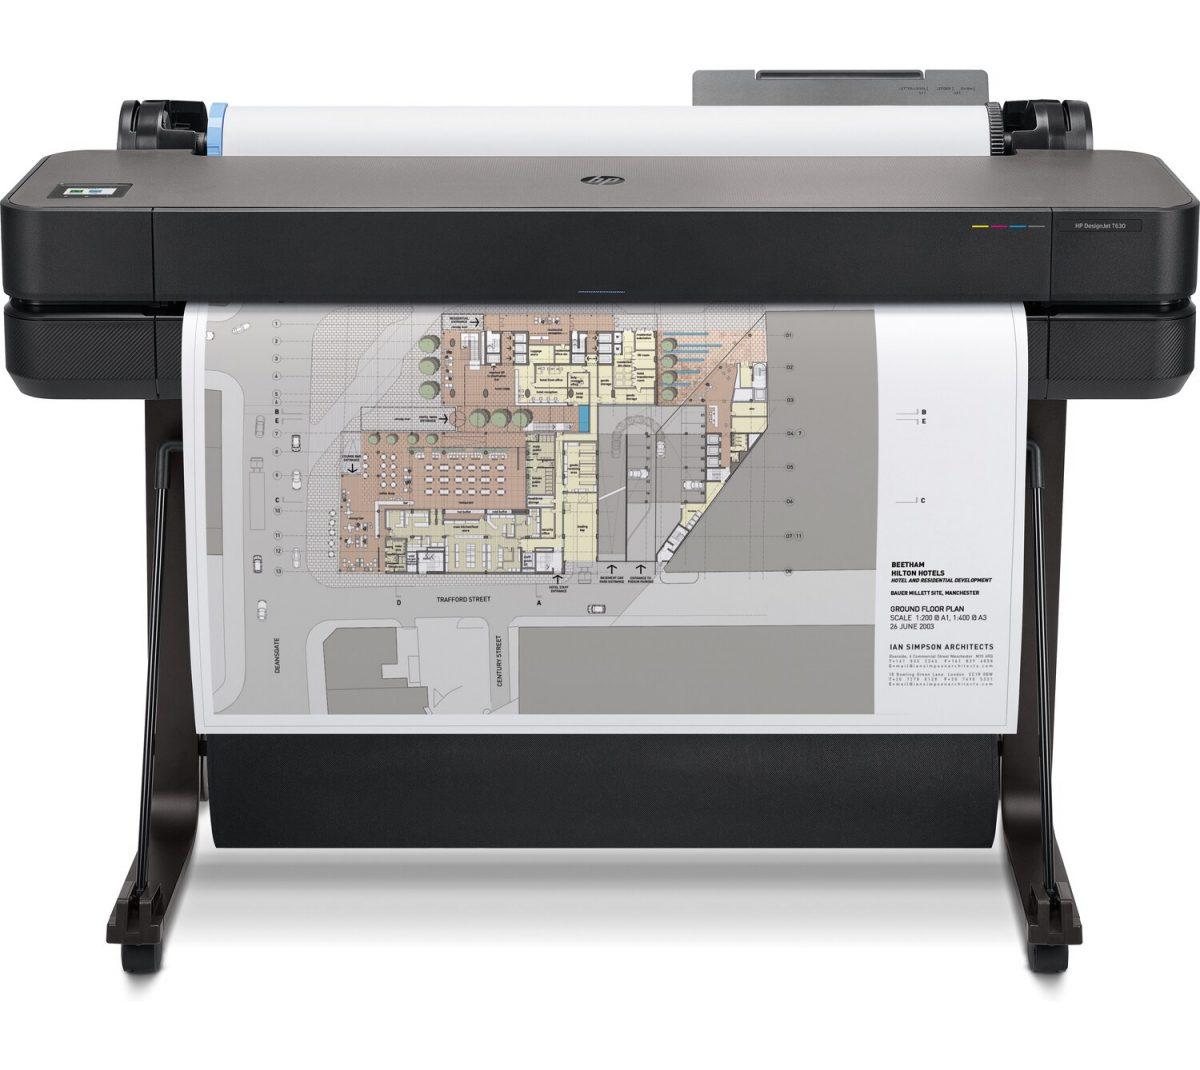 HP DesignJet T630 Large Format A0 Printer